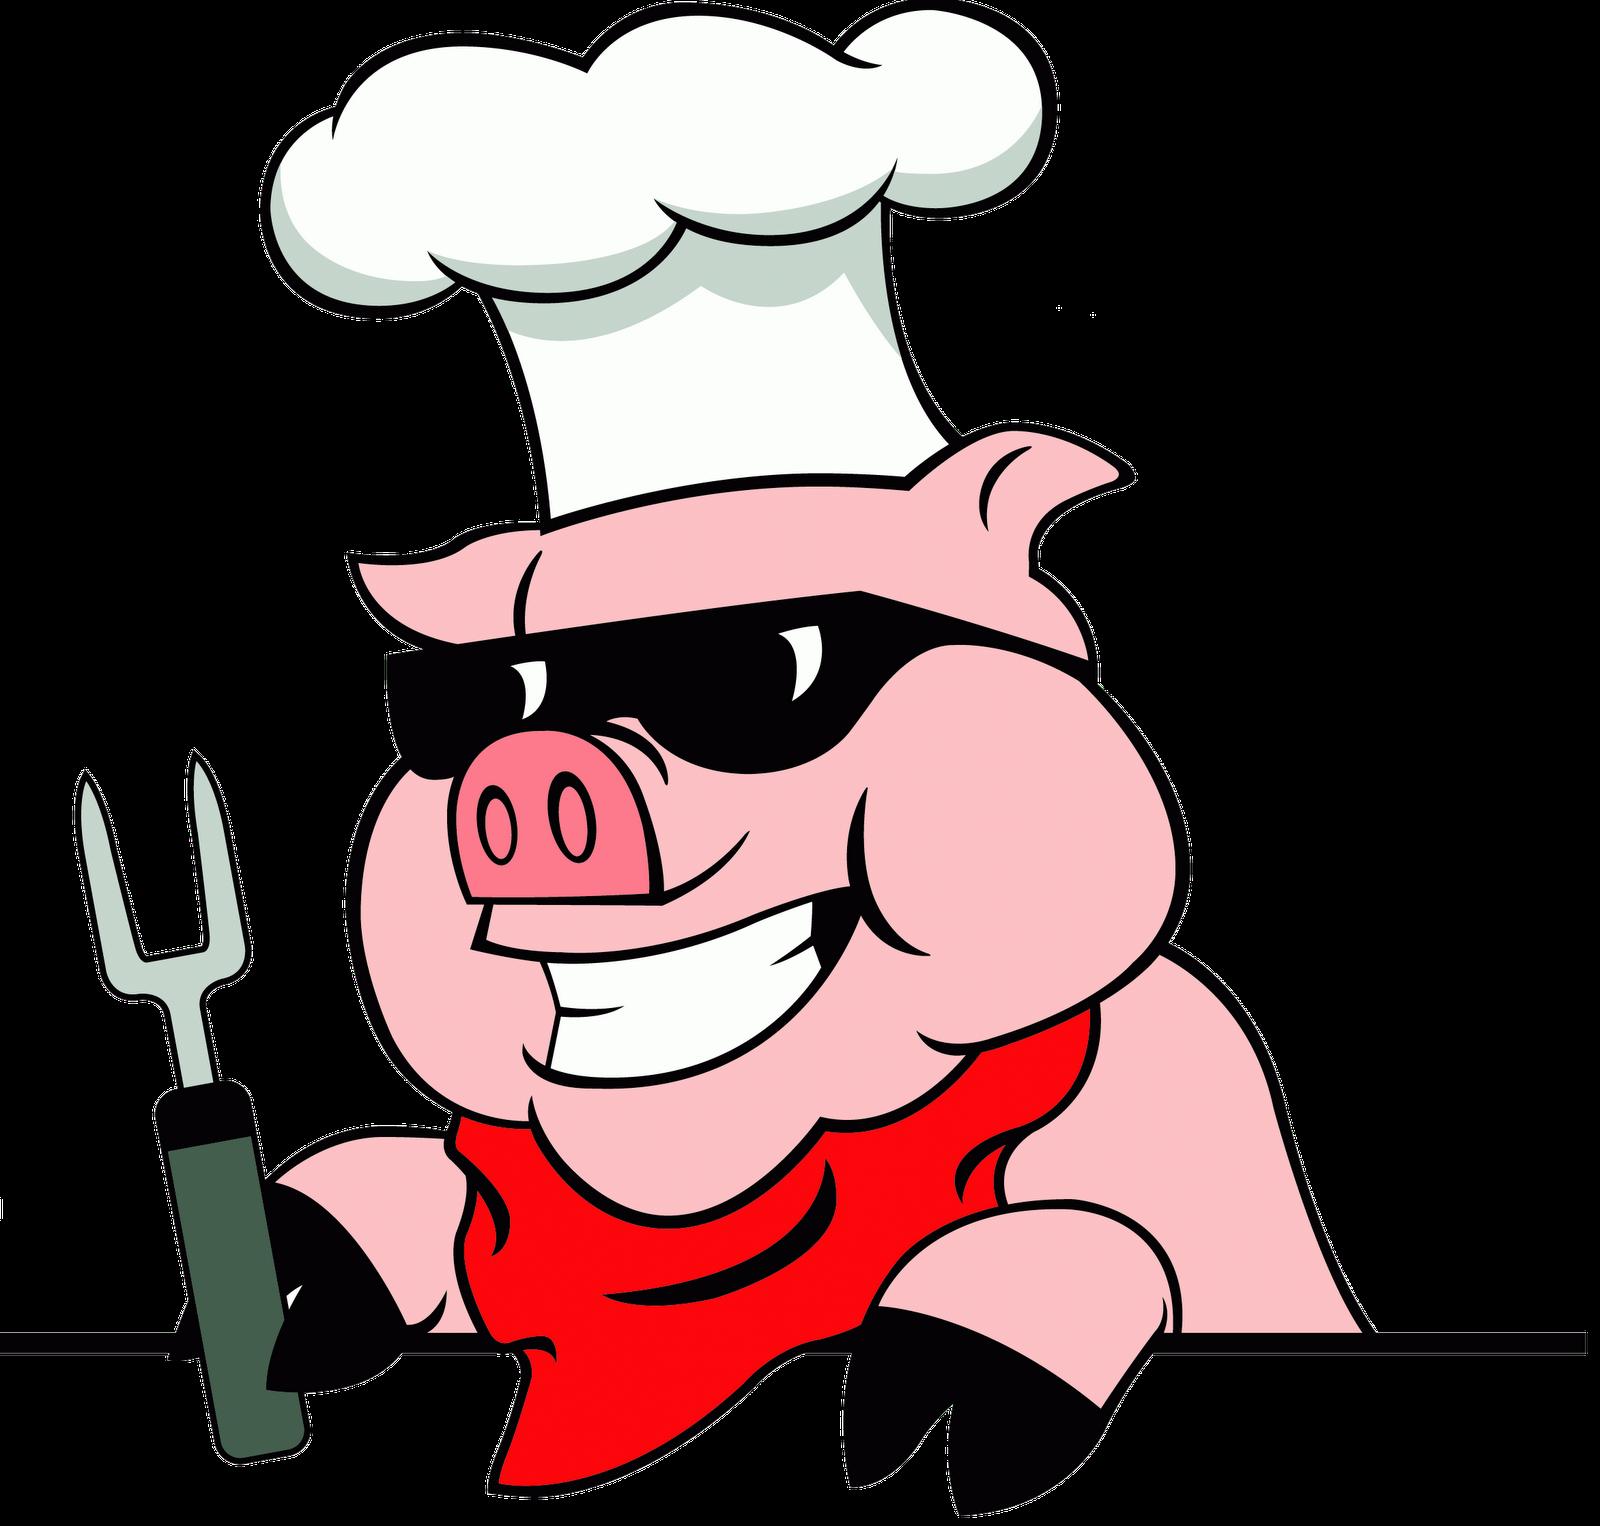 png pig roast transparent pig roast png images pluspng rh pluspng com pig roast clip art free hog roast clipart